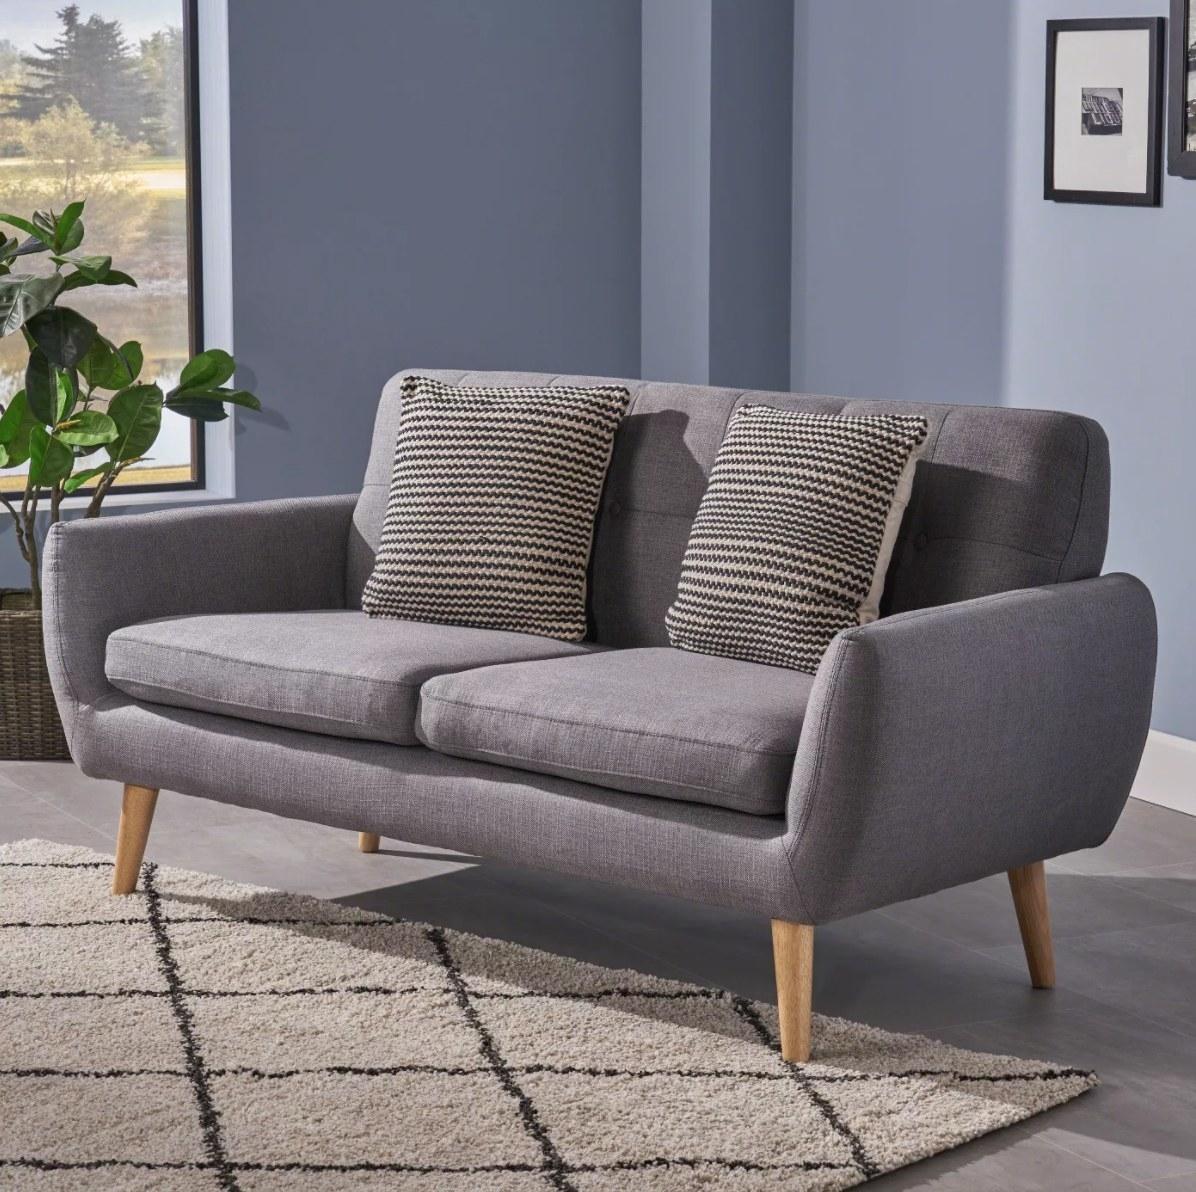 The midcentury modern sofa in dark gray with light wood legs